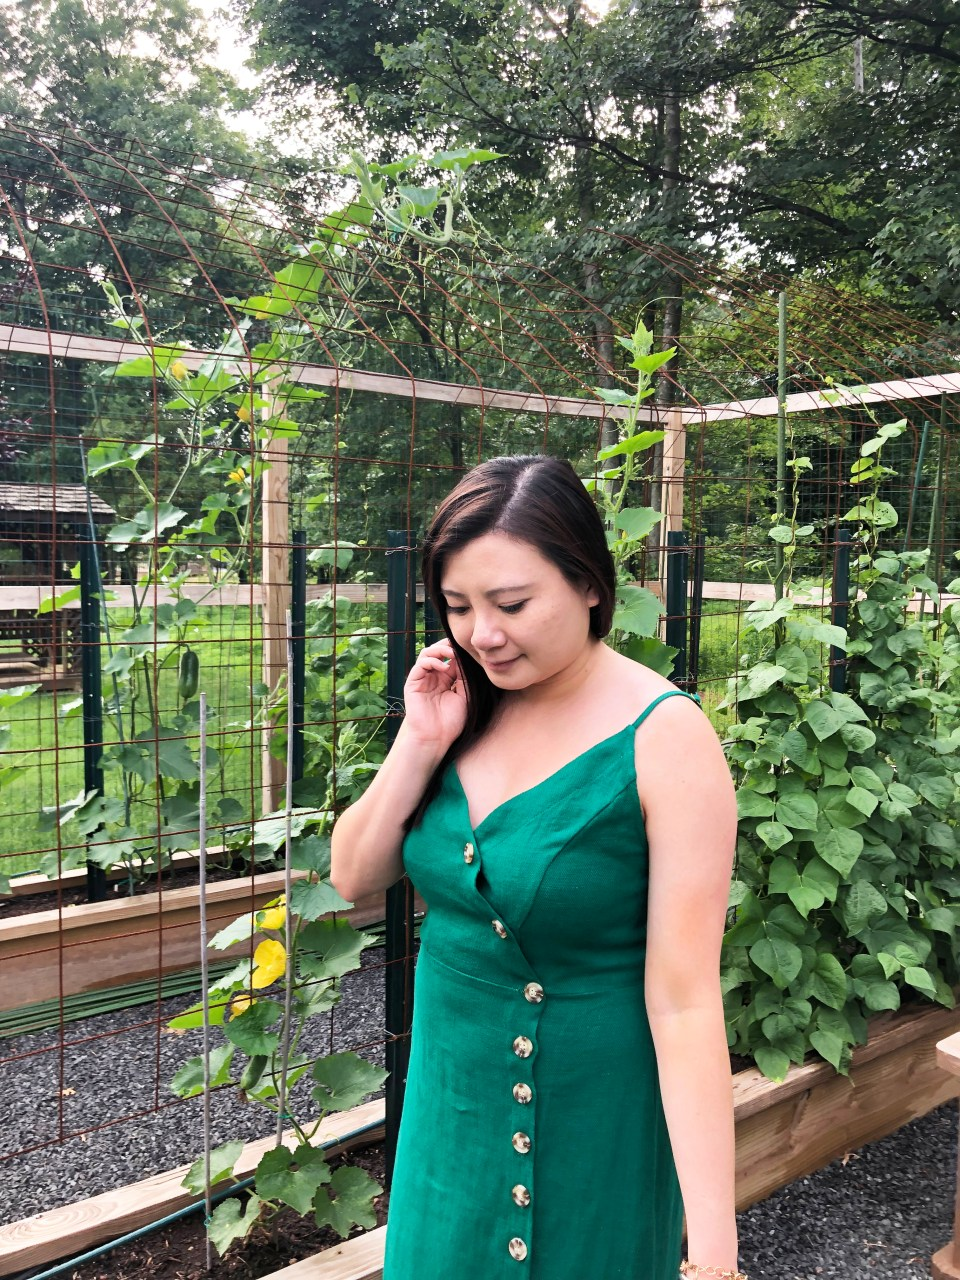 Green Asymmetrical Button Dress 13